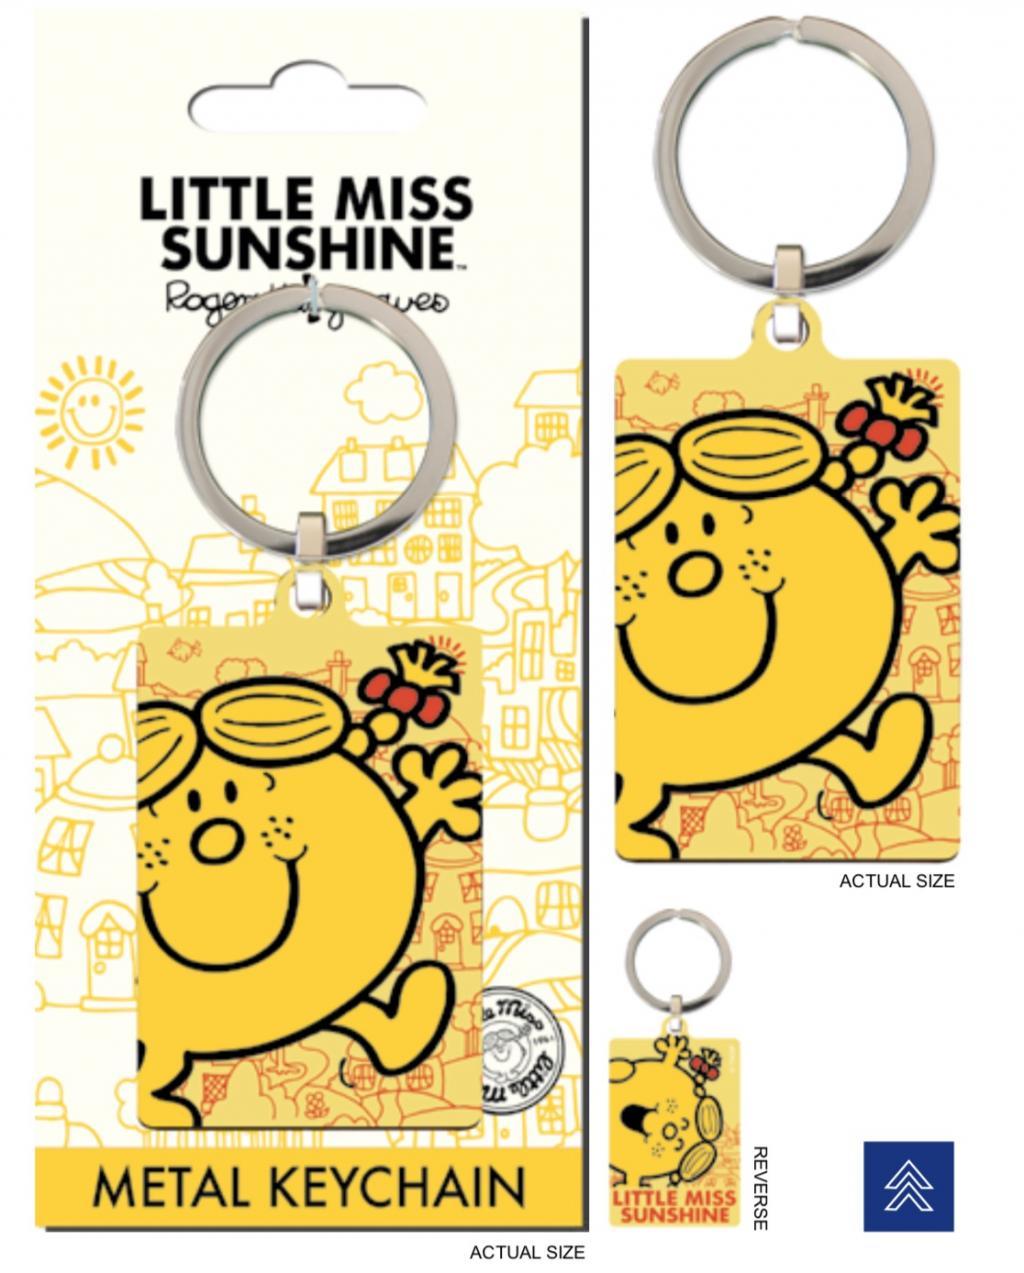 MR. MEN LITTLE MISS - Porte-Cles Metal - Little Miss Sunshine